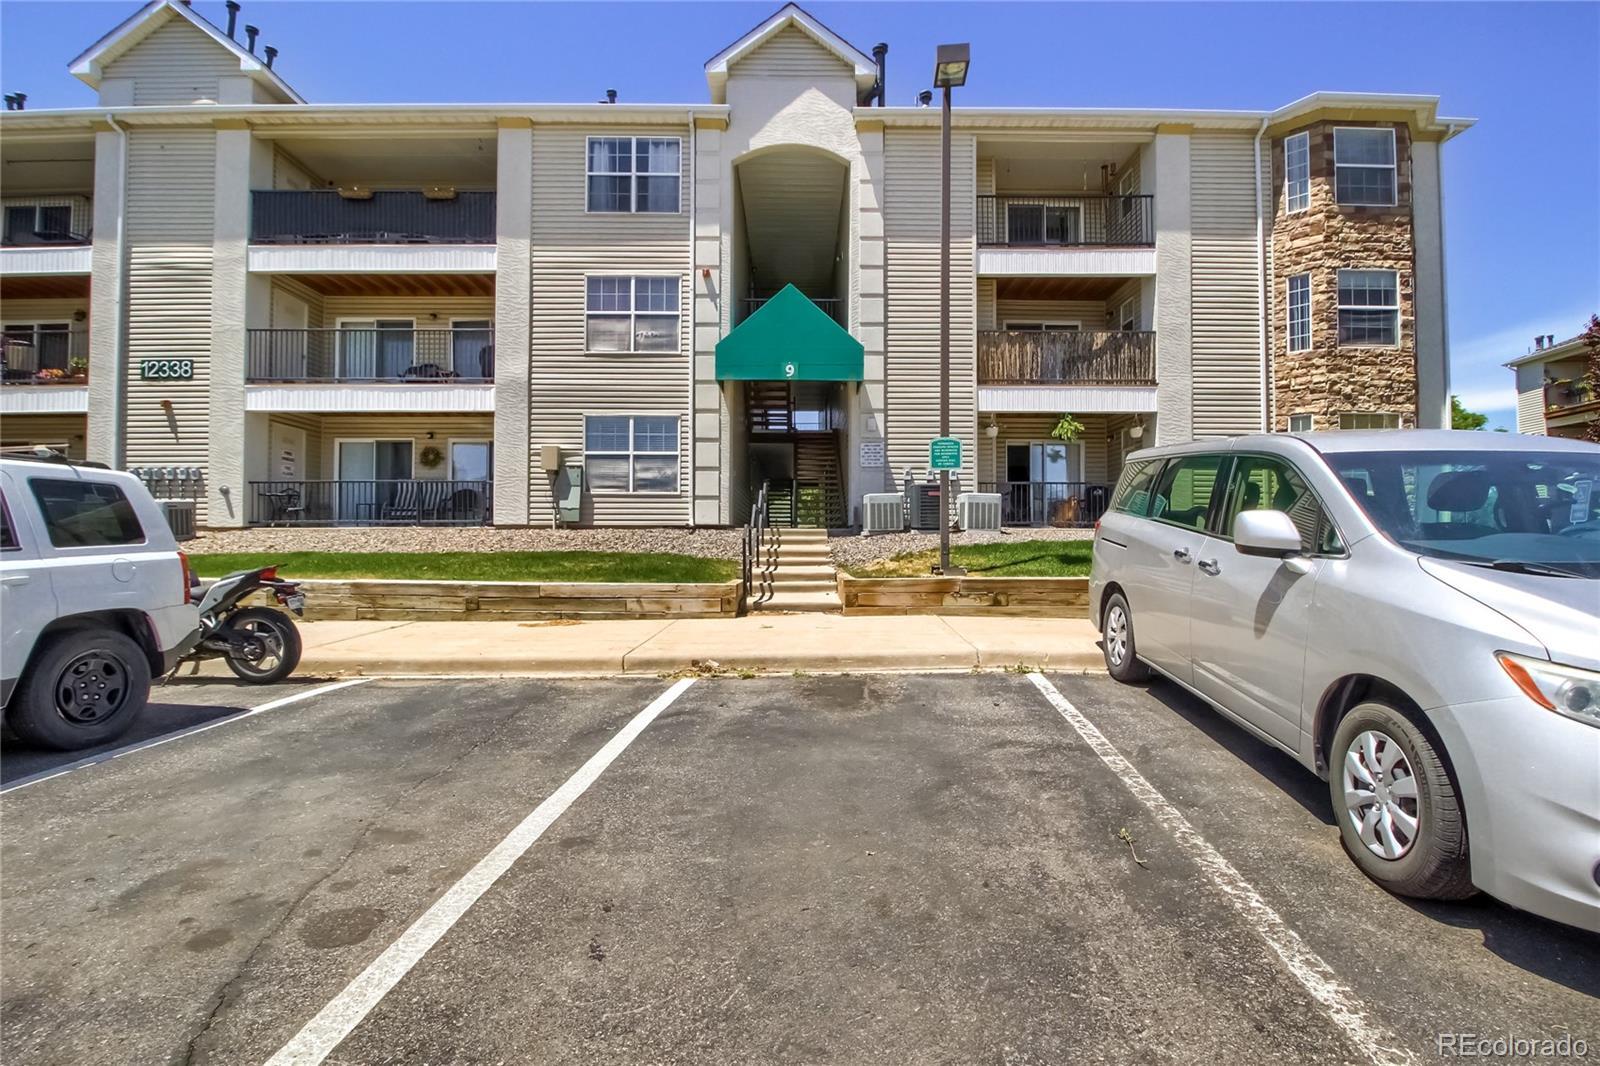 MLS# 8175765 - 3 - 12338 W Dorado Place #201, Littleton, CO 80127